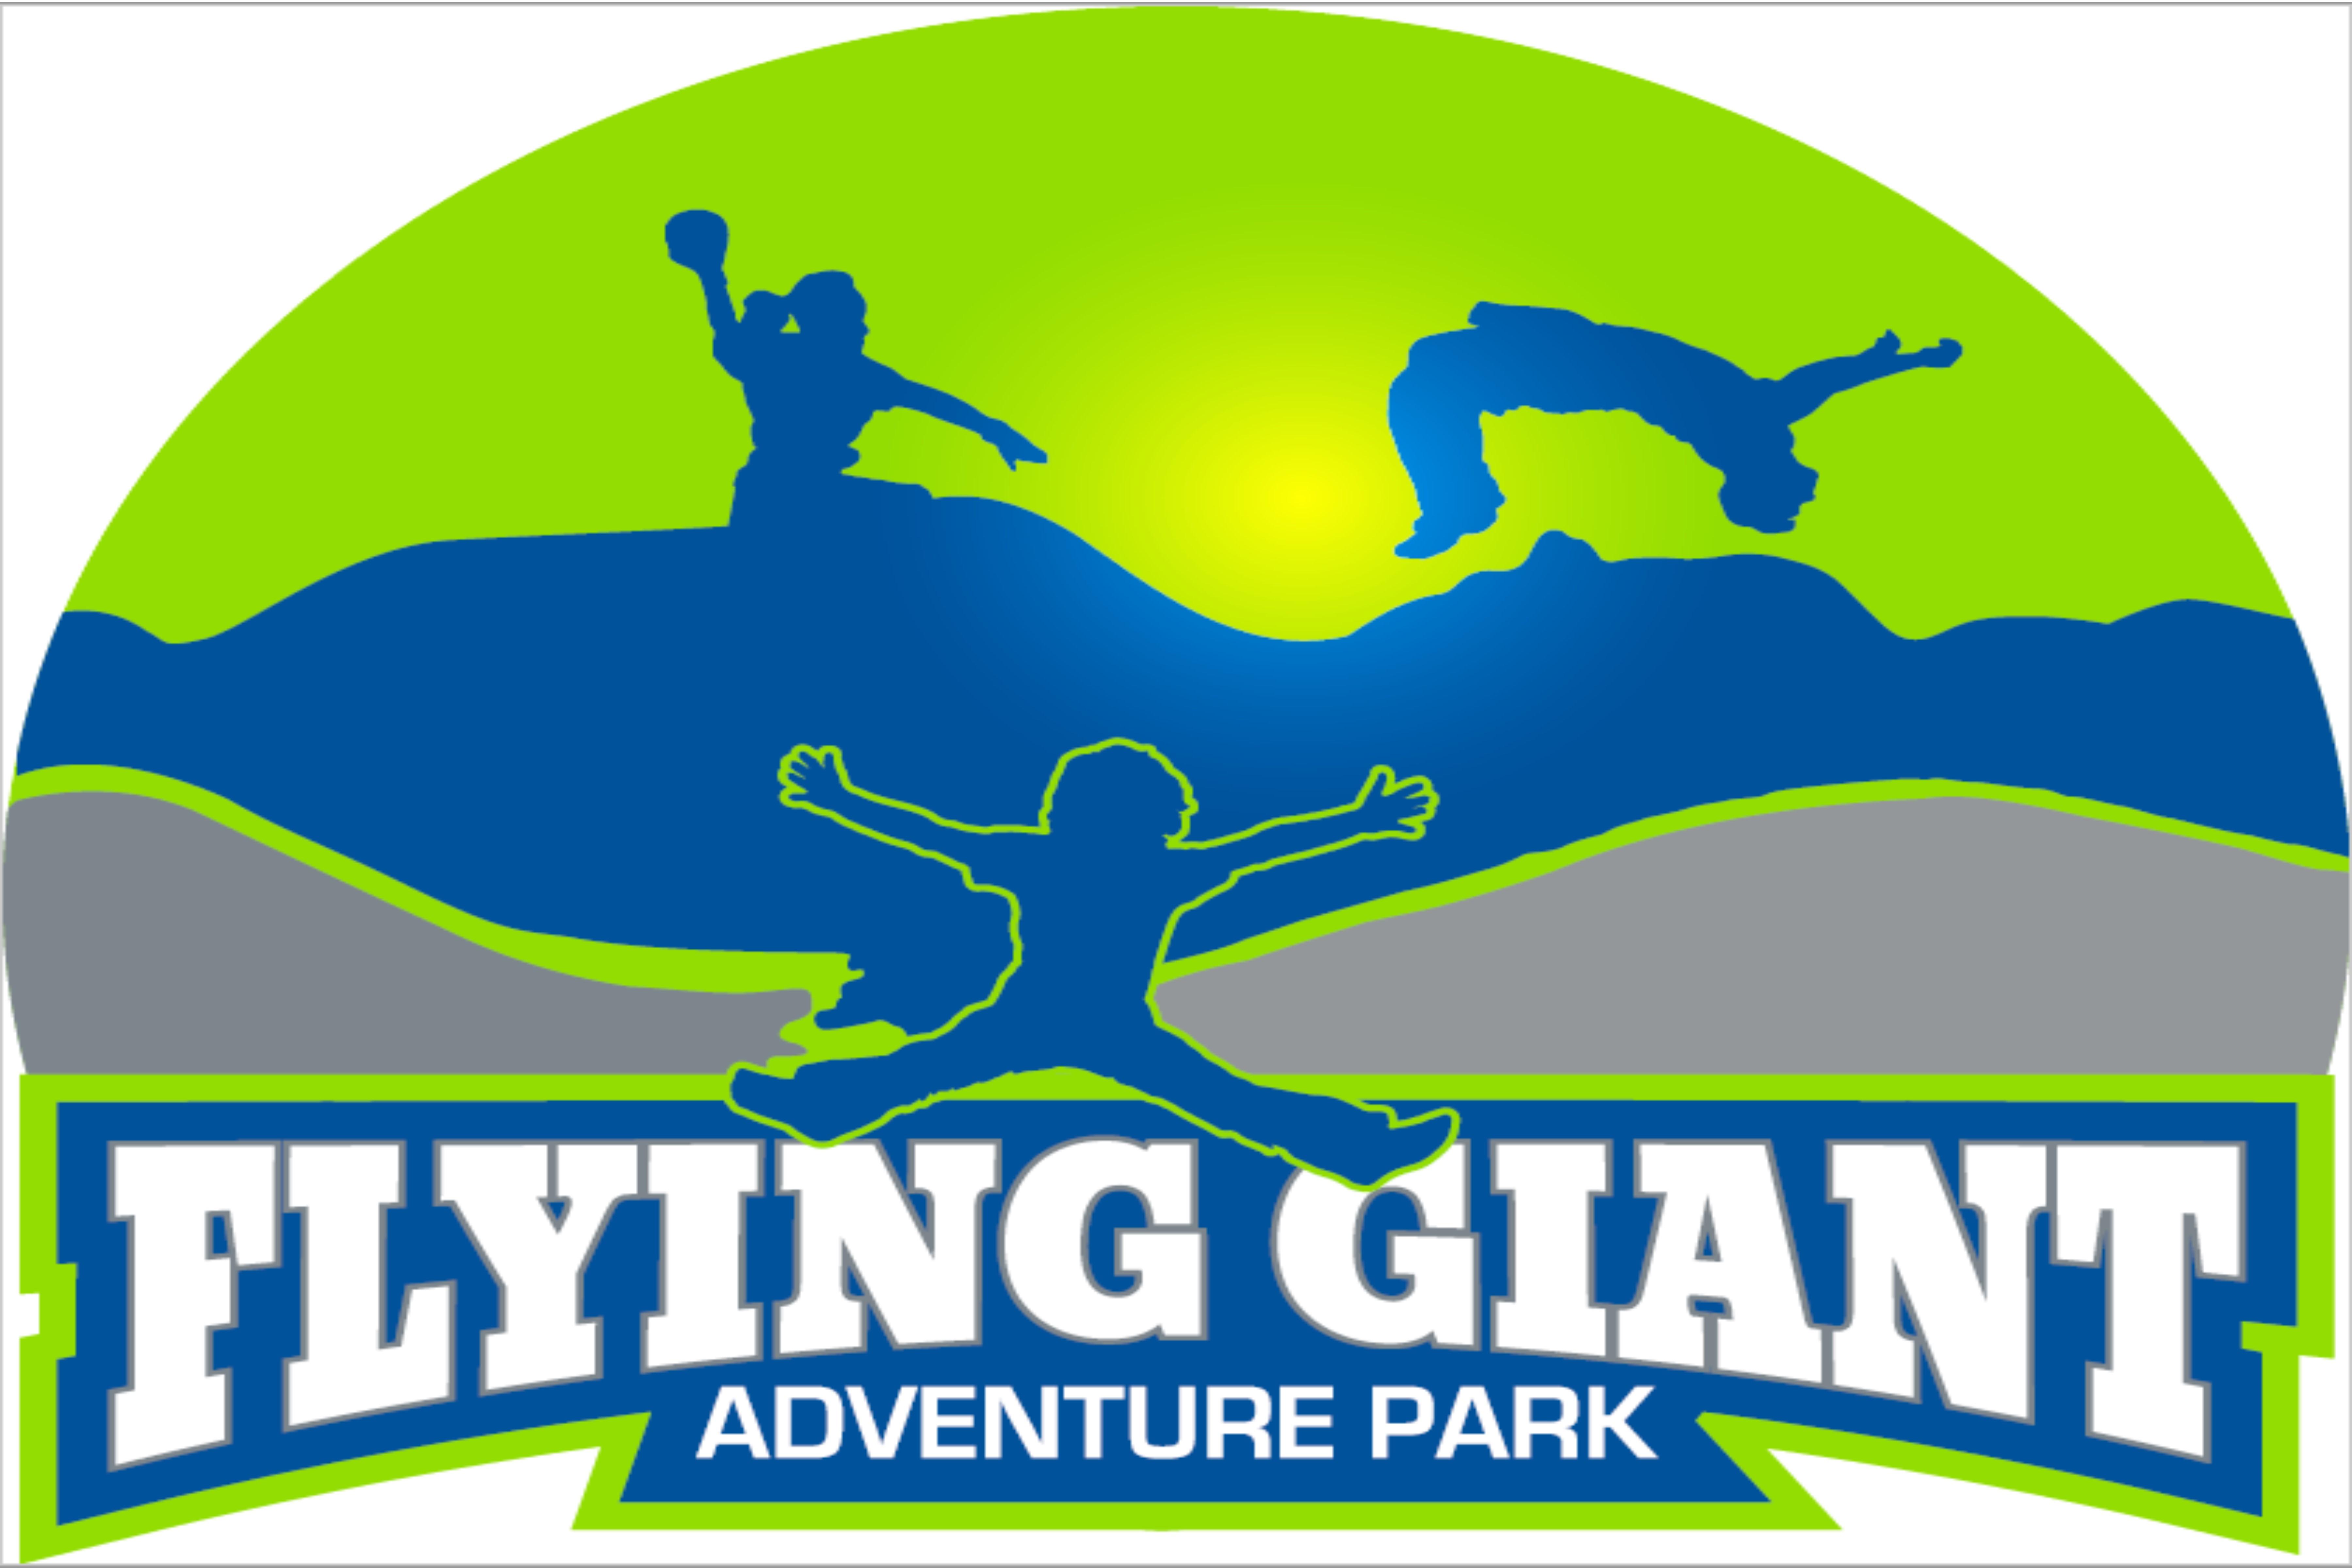 FLYING GIANT ADVENTURE PARK